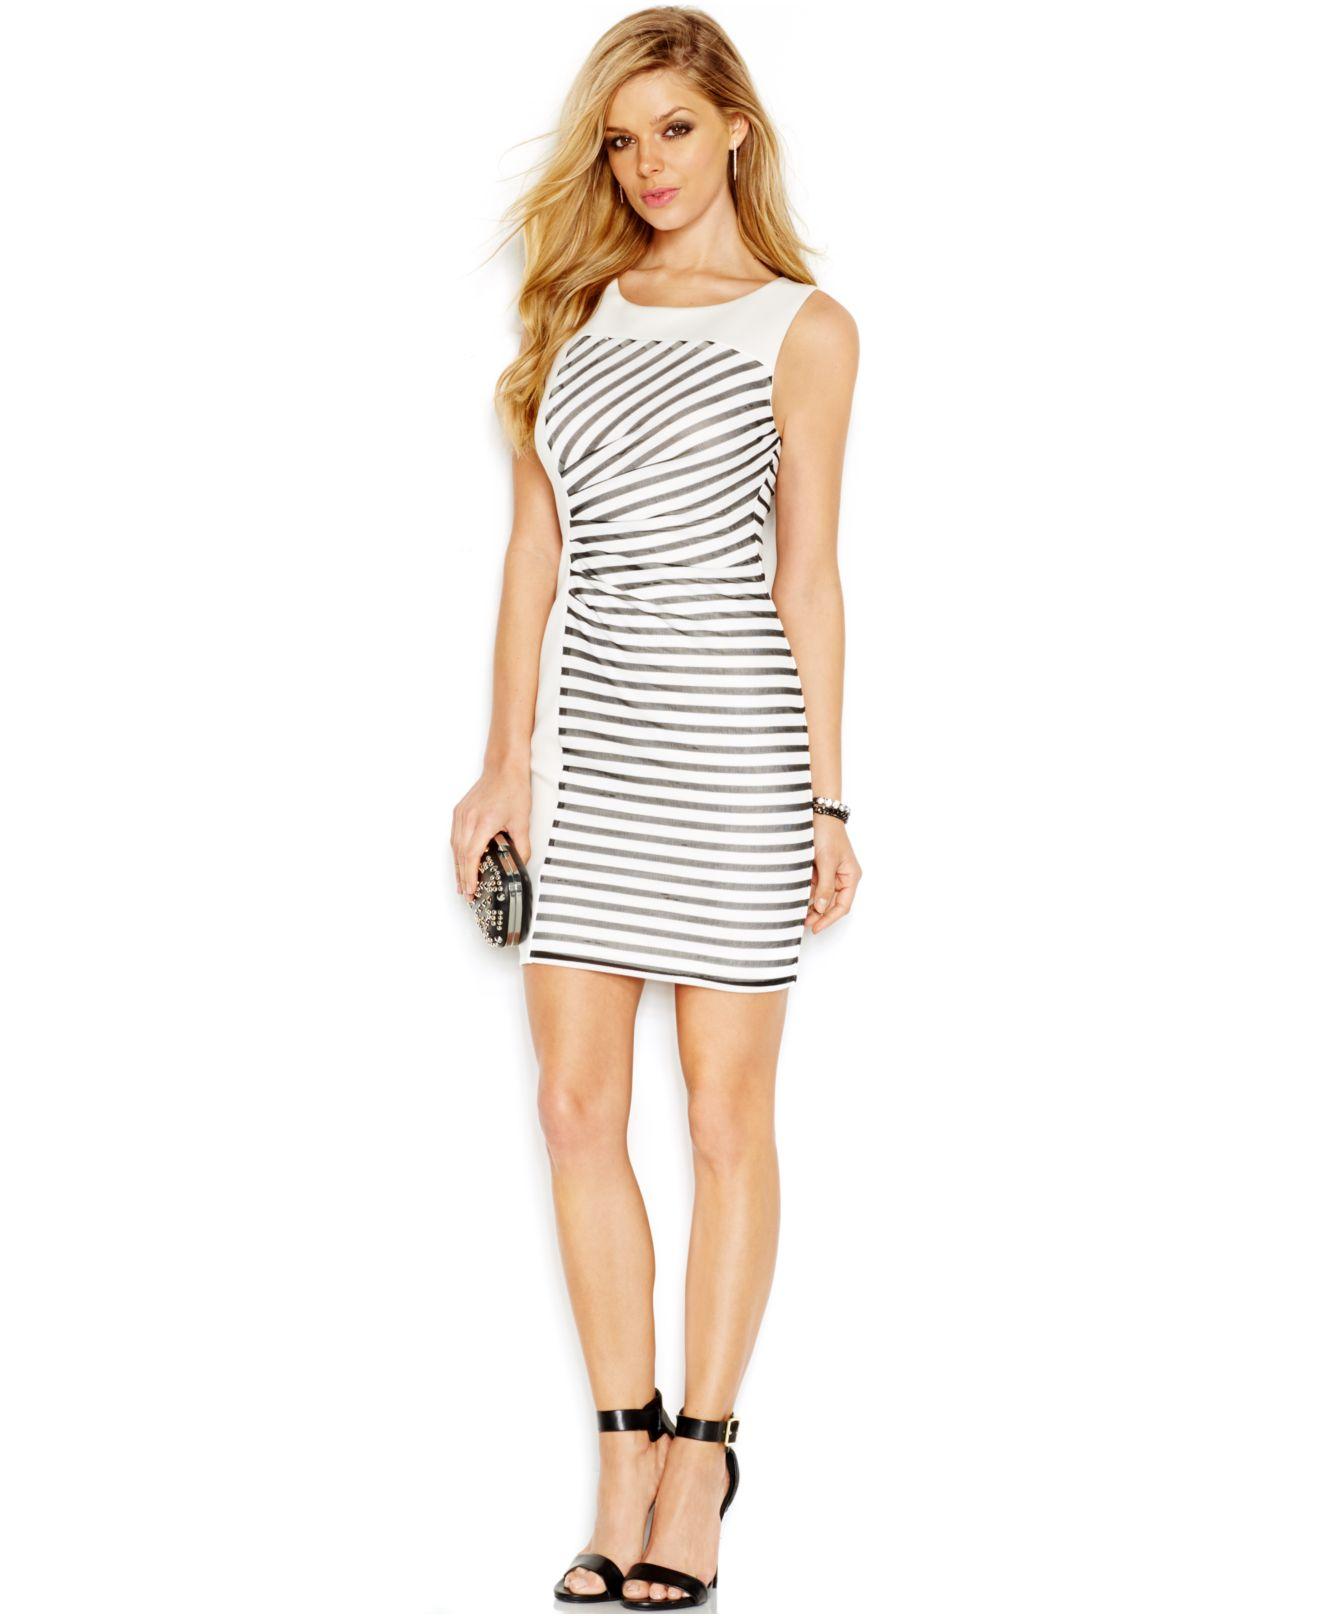 d3f680410a9dc Lyst - Guess Mesh-Stripe Colorblock Body-Con Dress in Black